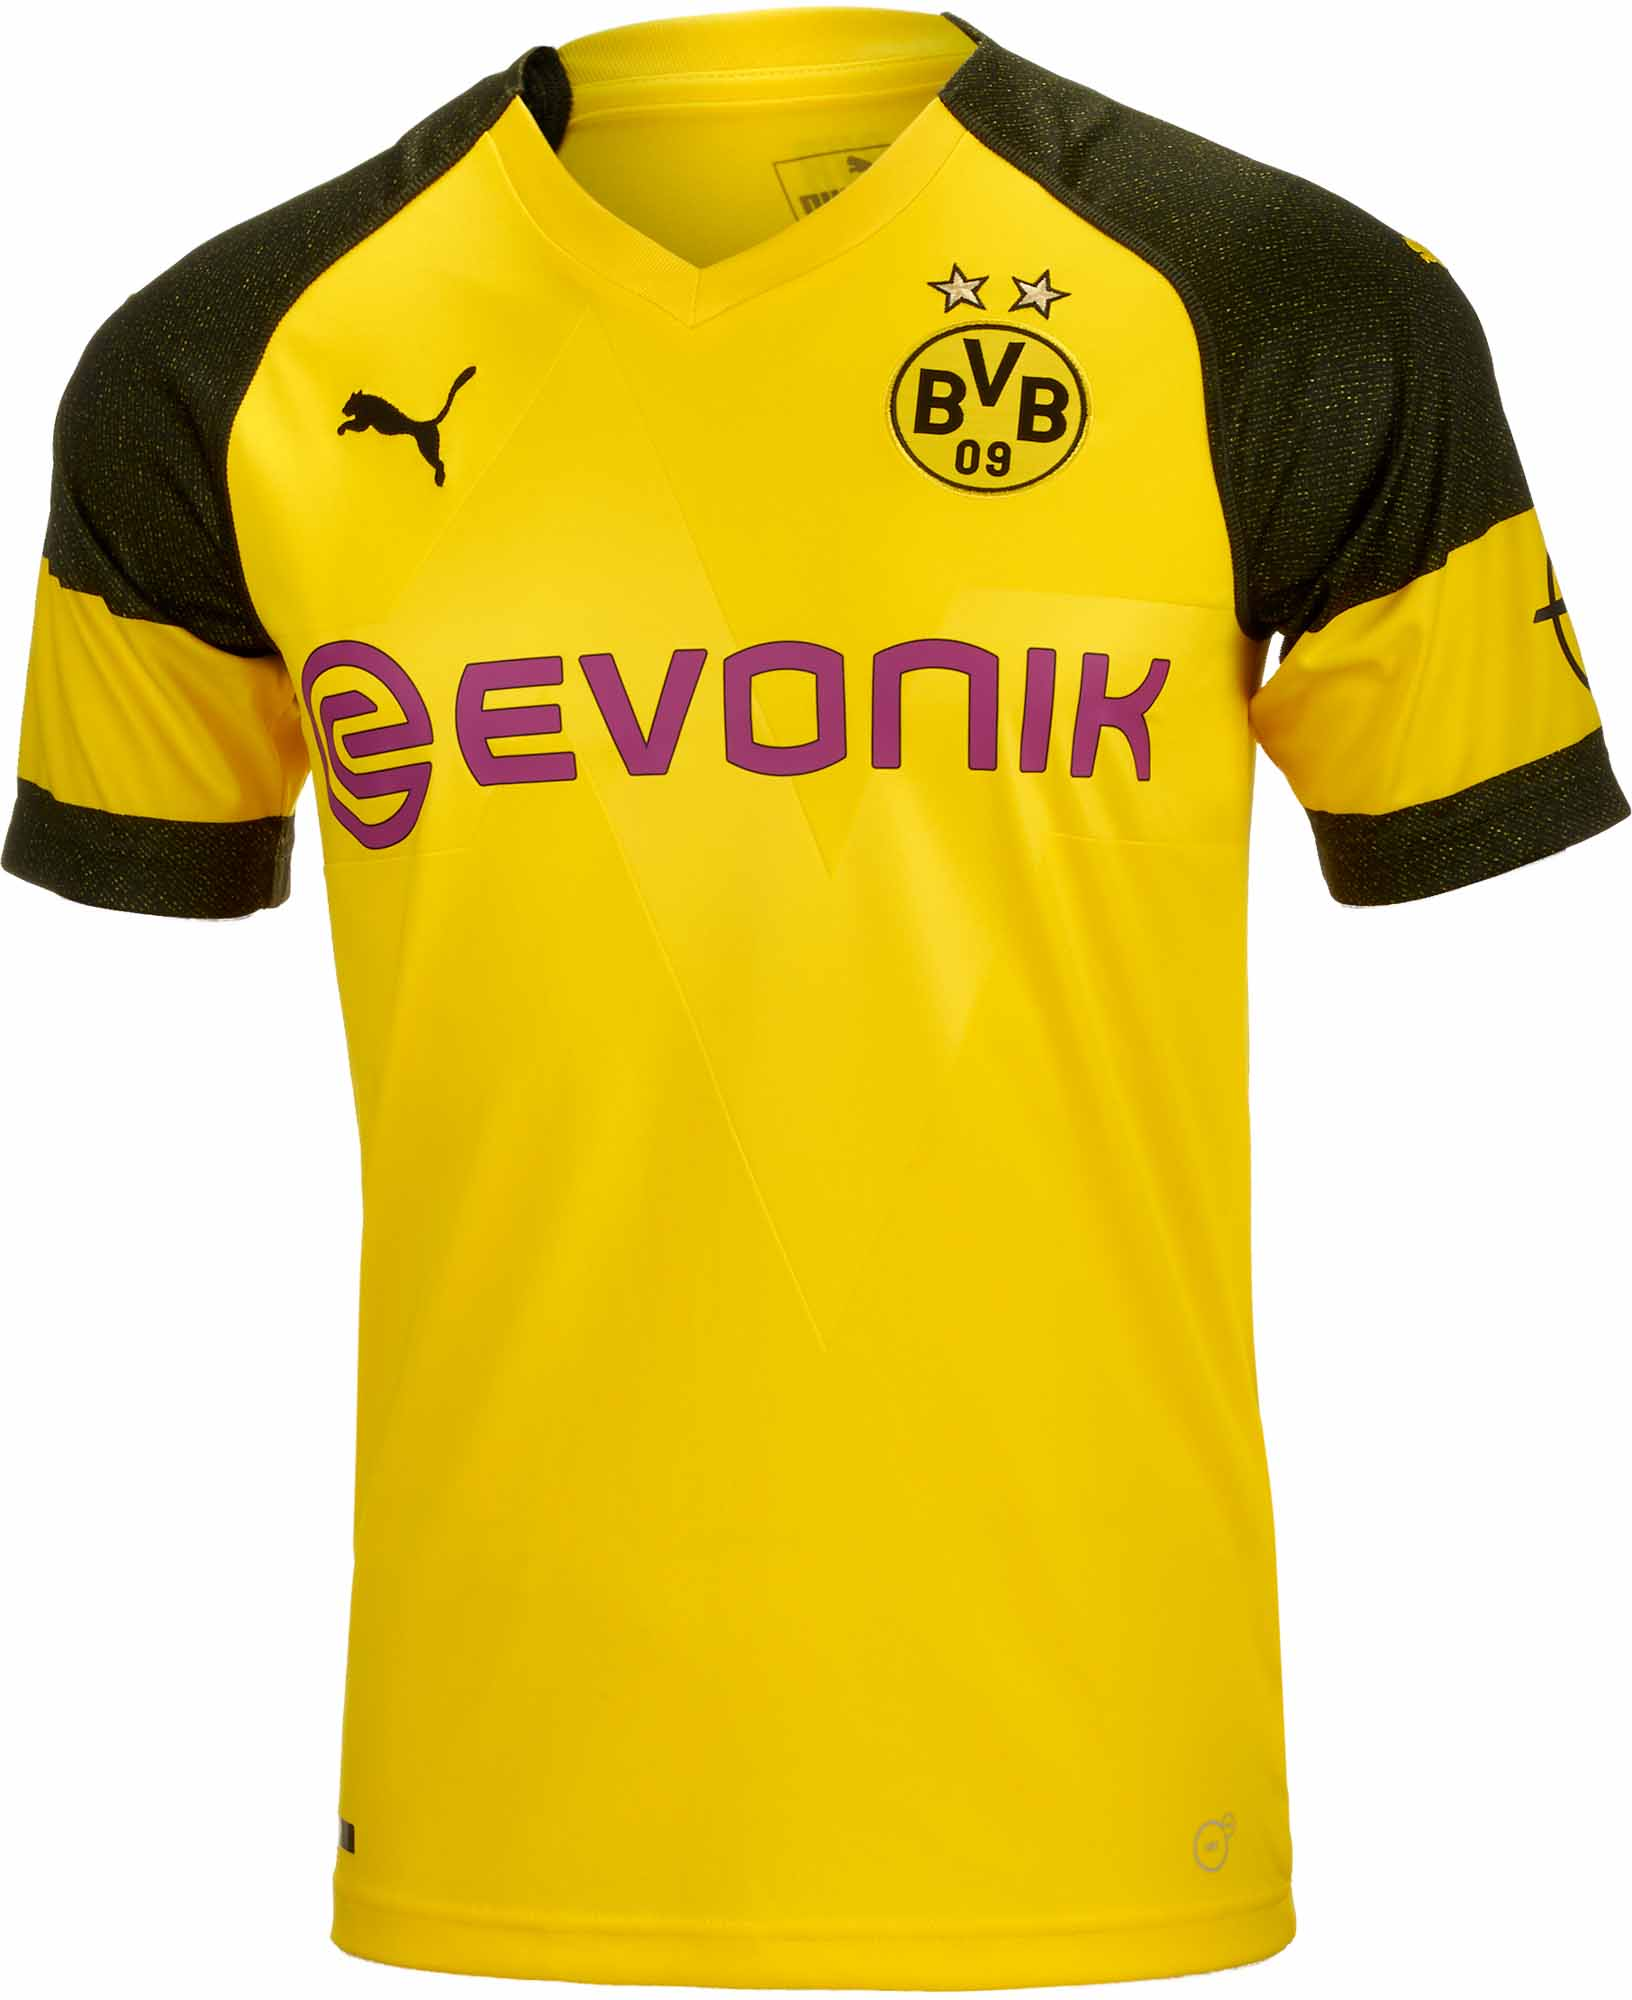 ad24b4fdabe 2018/19 PUMA Borussia Dortmund Home Jersey - SoccerPro